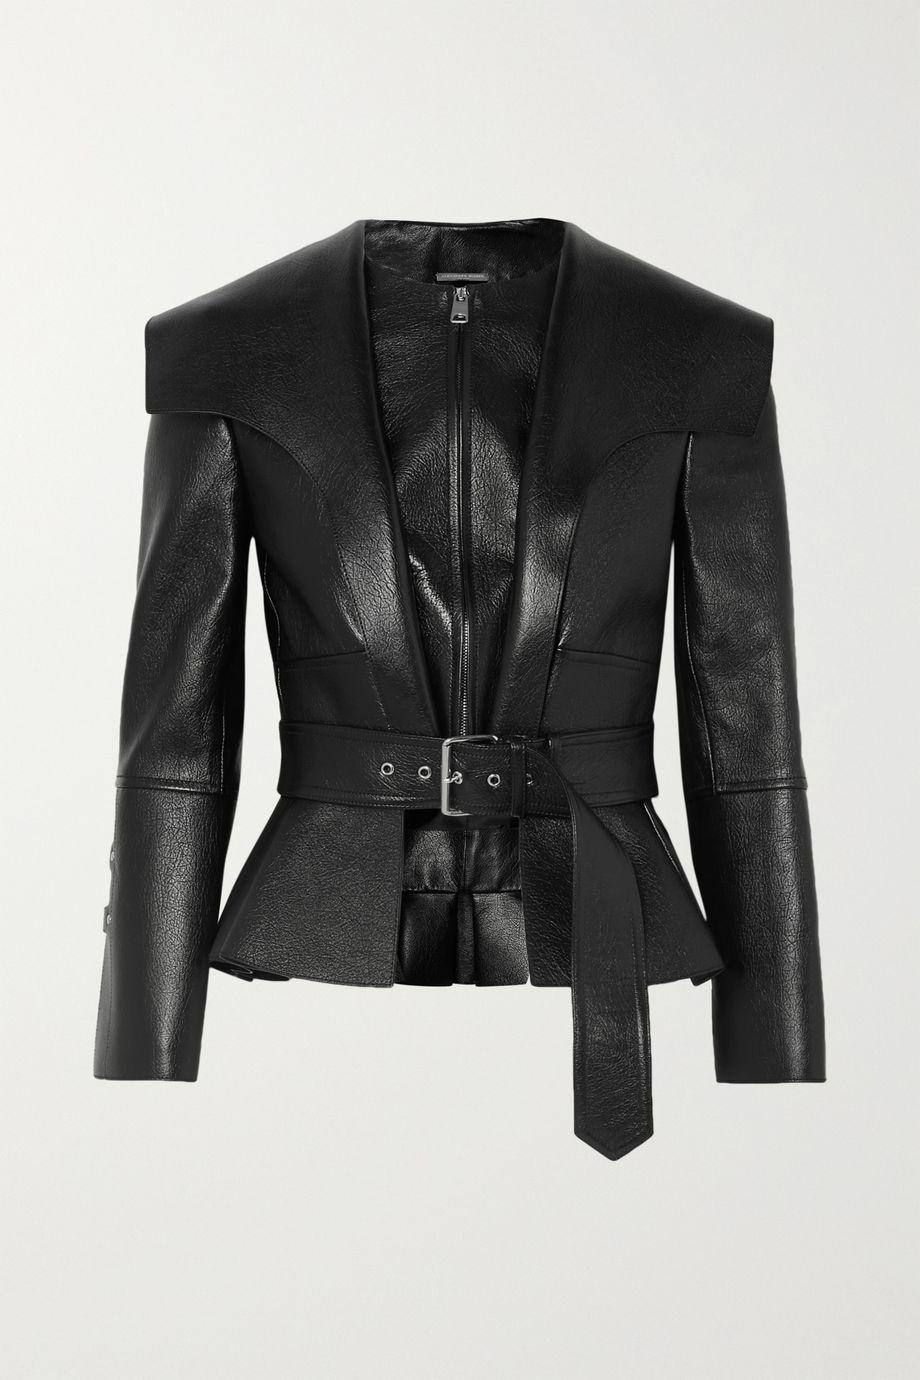 Alexander McQueen Textured-leather belted peplum jacket